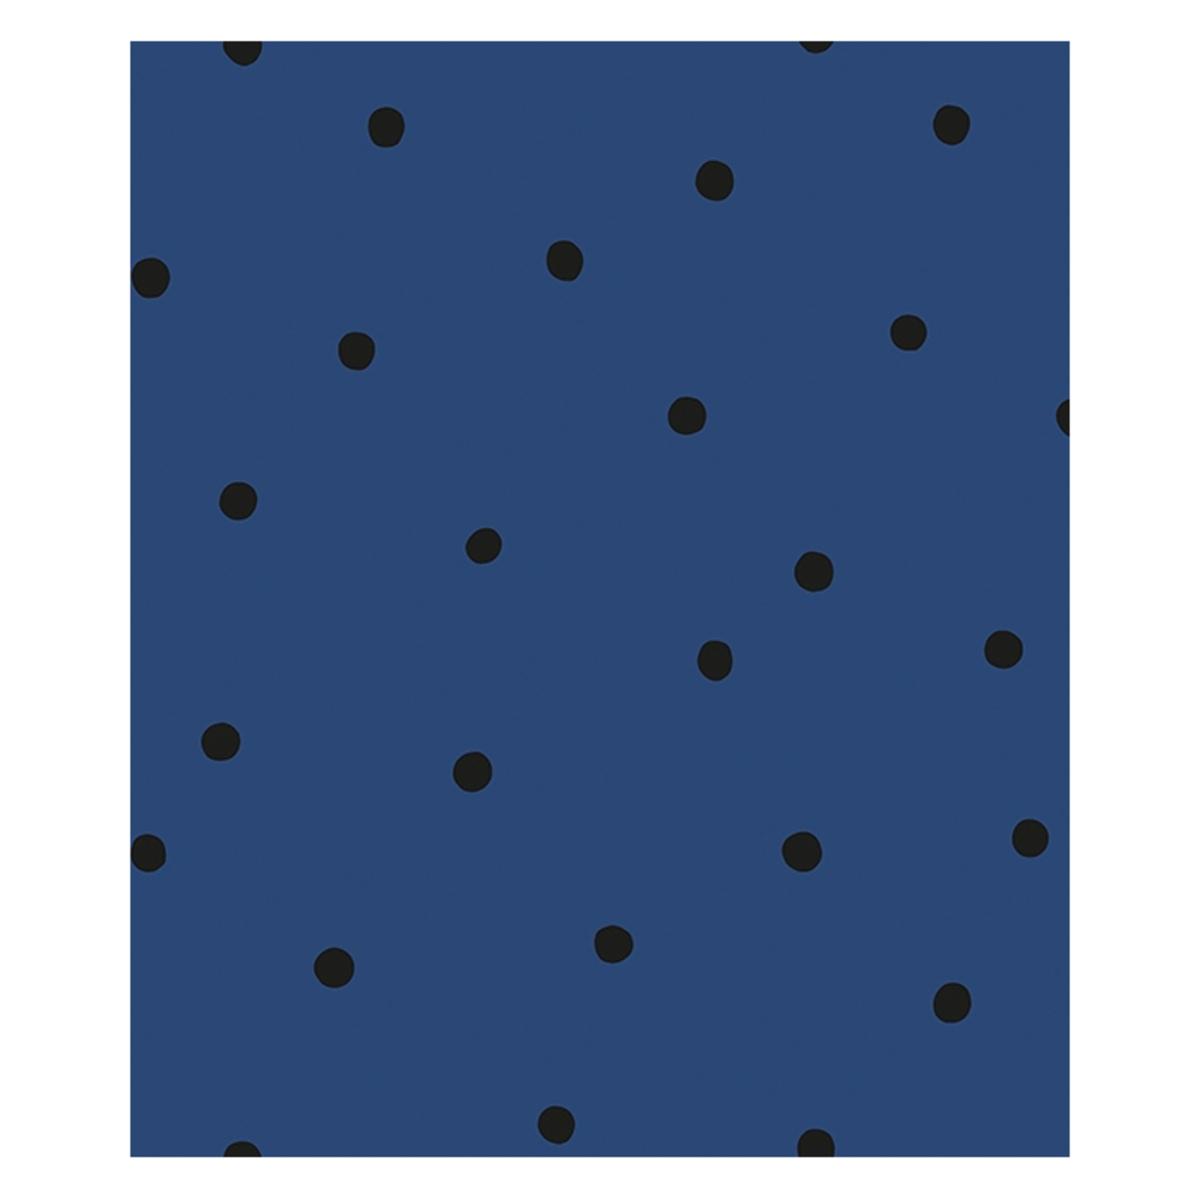 Papier peint Papier Peint Minima - Bleu Marine et Pois Noirs Papier Peint Minima - Bleu Marine et Pois Noirs